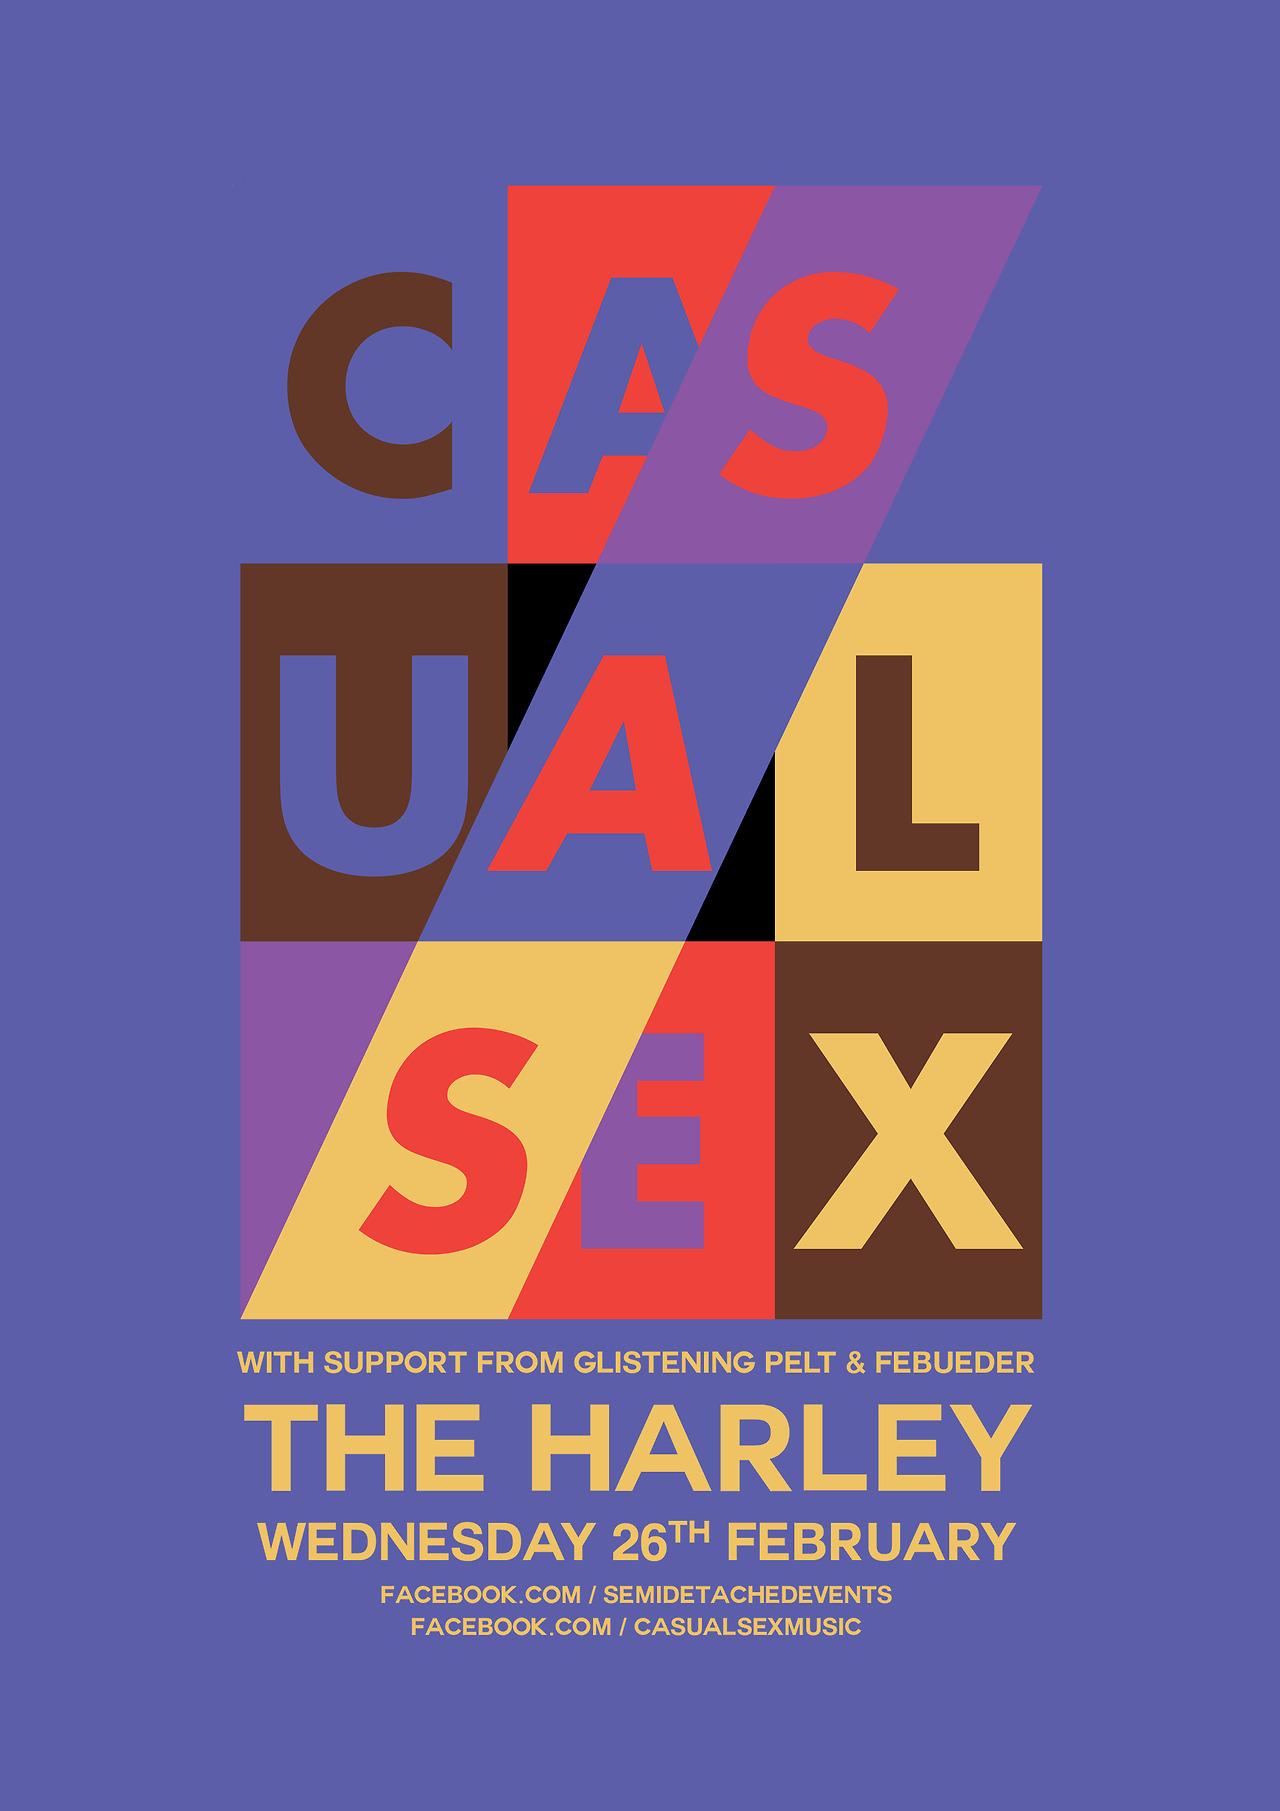 CASUAL SEX + Febueder + Glistening Pelt More information here https://www.facebook.com/events/394359097366939/ https://www.facebook.com/semidetachedevents